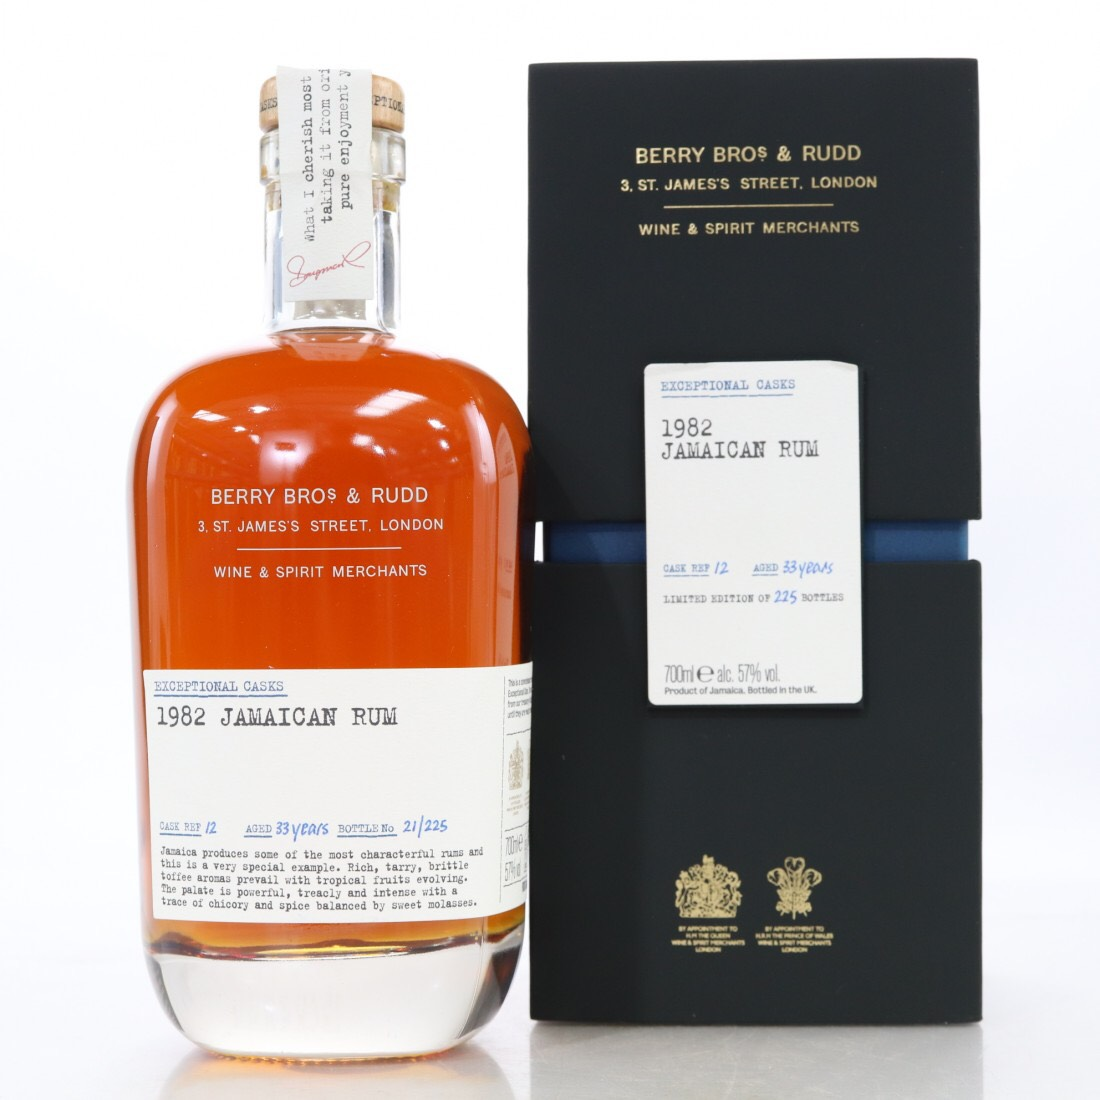 Bottle image of Jamaican Rum